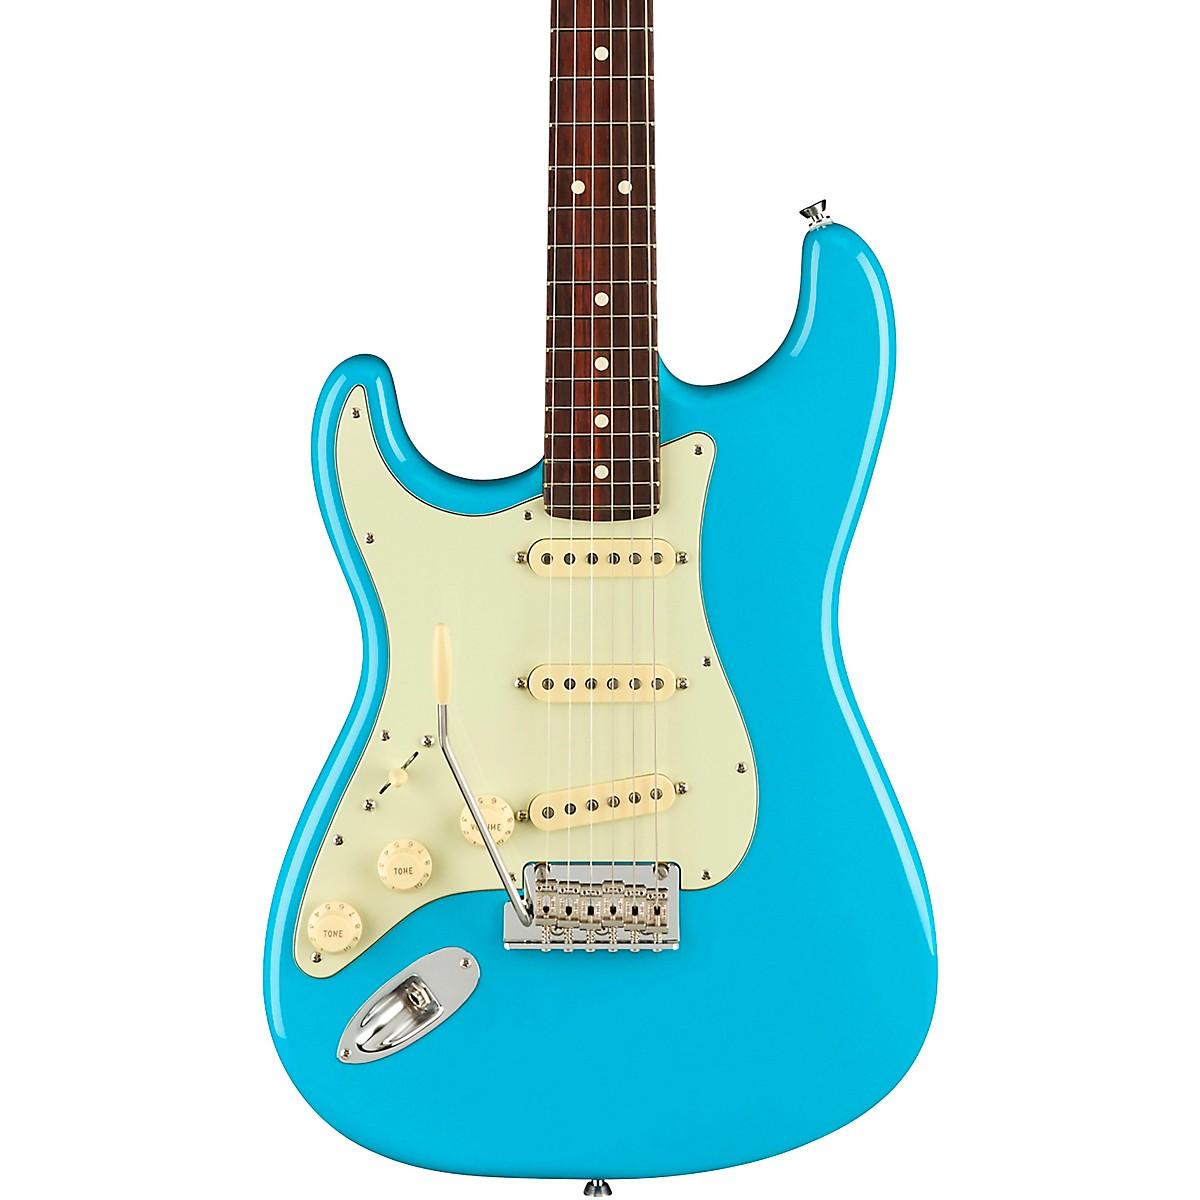 Fender American Professional II Stratocaster Rosewood Fingerboard Left-Handed Electric Guitar